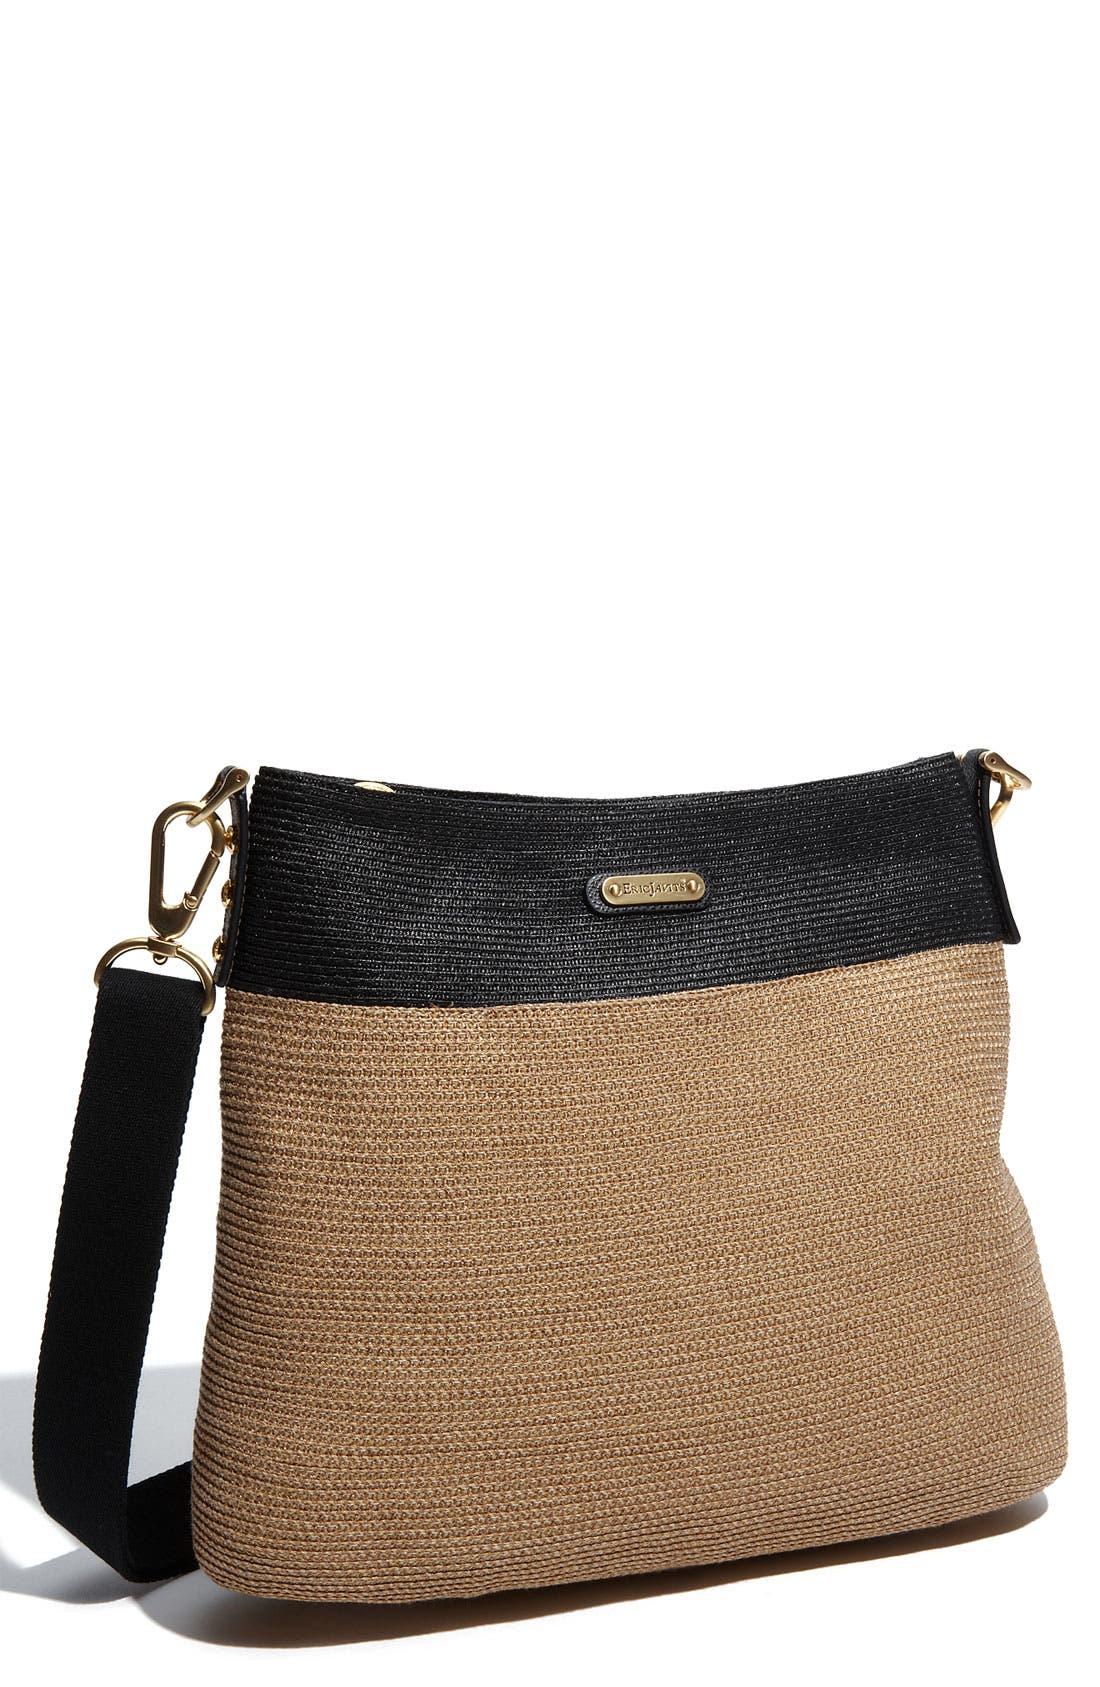 Main Image - Eric Javits 'Escape' Convertible Squishee® Shoulder Bag